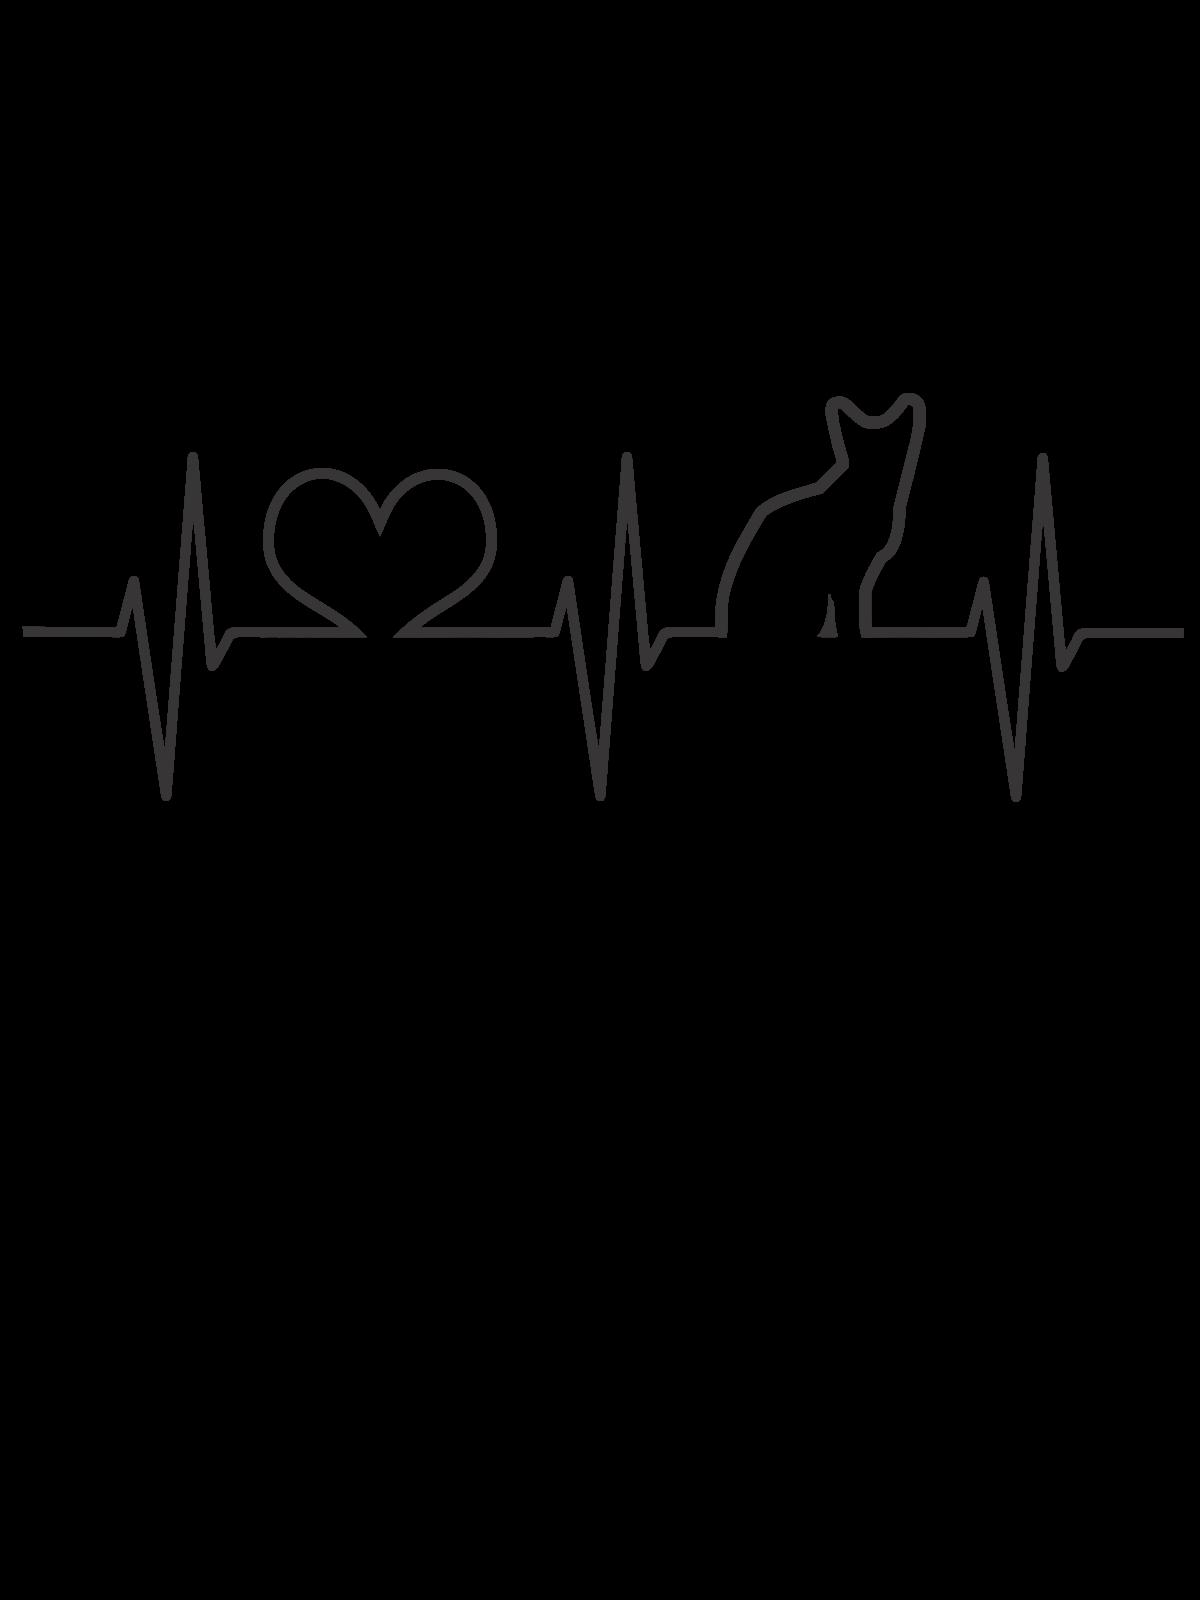 Heartbeat and Ninja